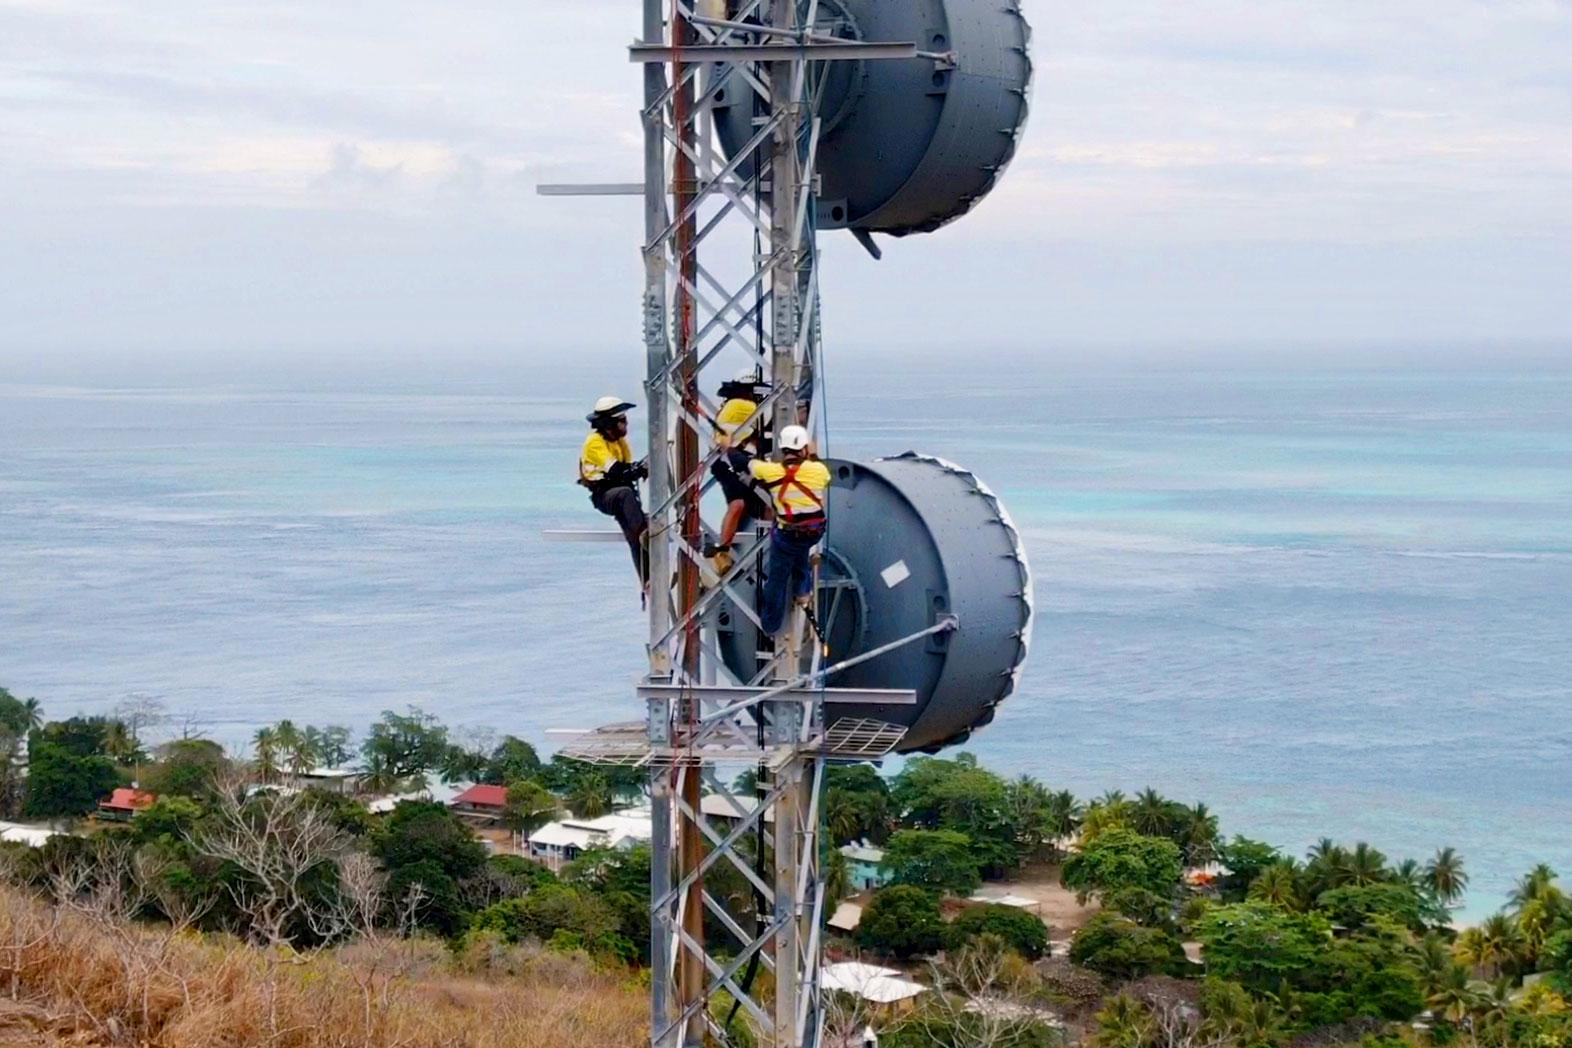 Three people working on an Amplitel tower